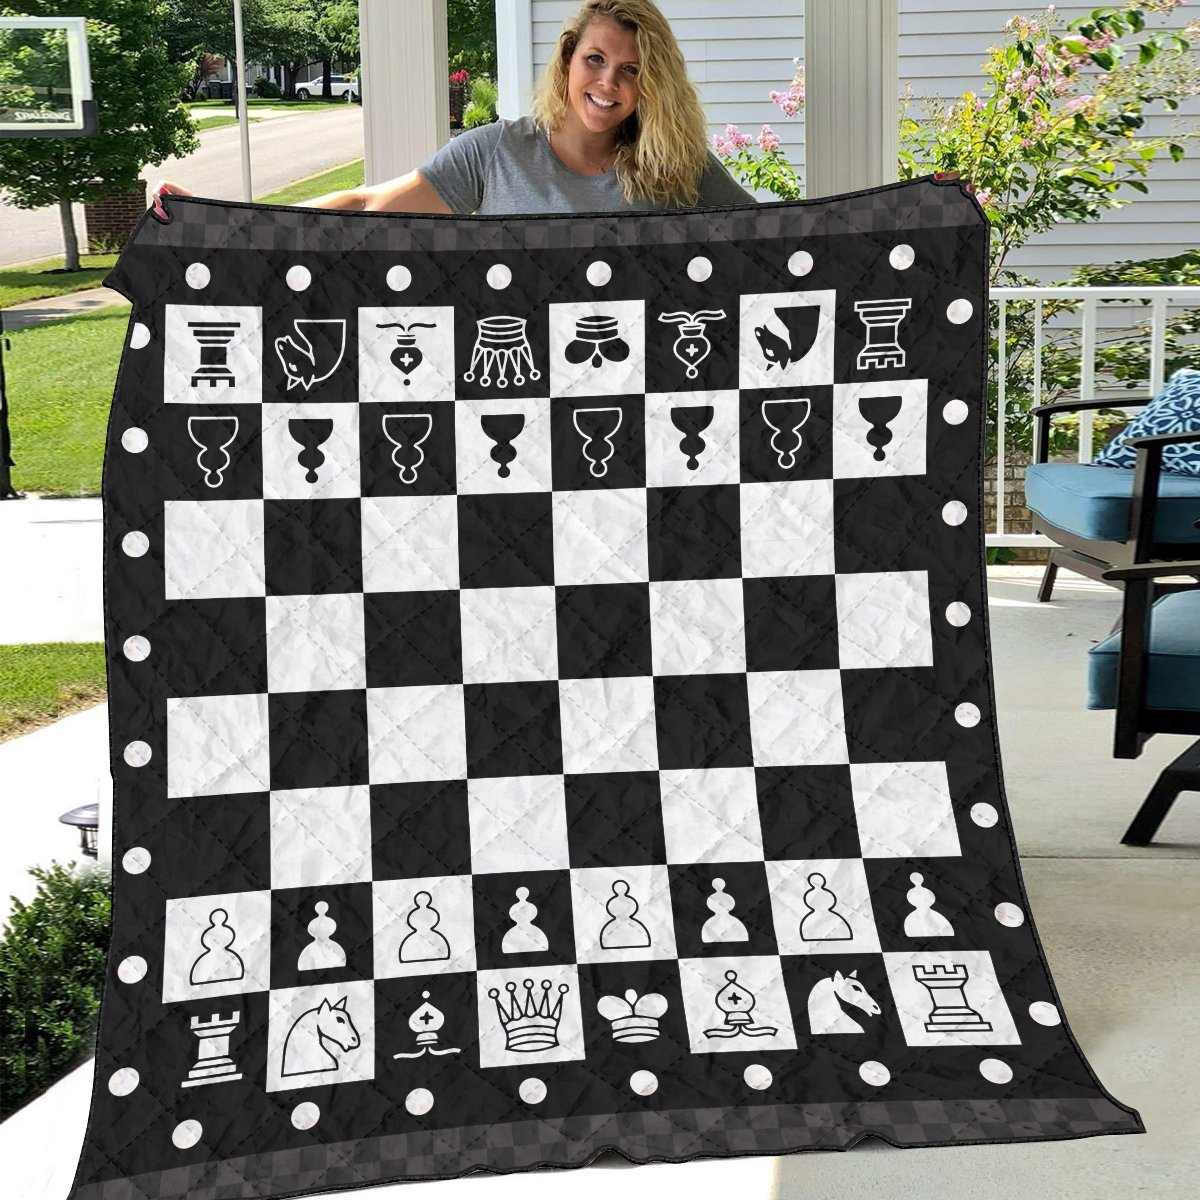 chessboard quilt blanket 235246 - Otaku Treat